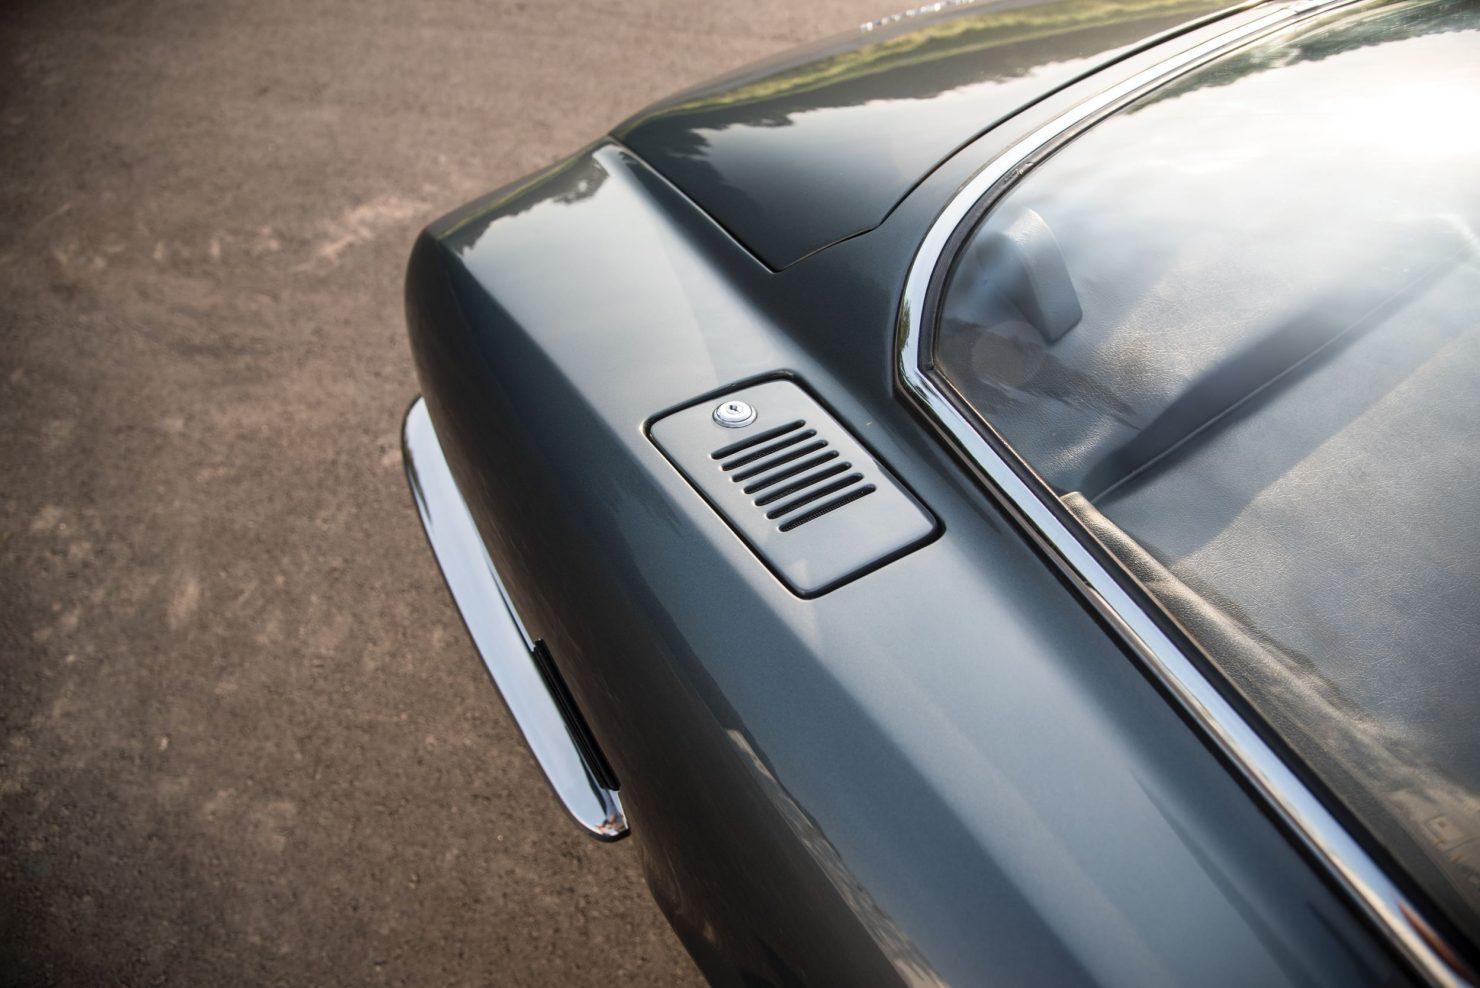 iso grifo car 8 1480x988 - 1966 Iso Grifo GL Series I